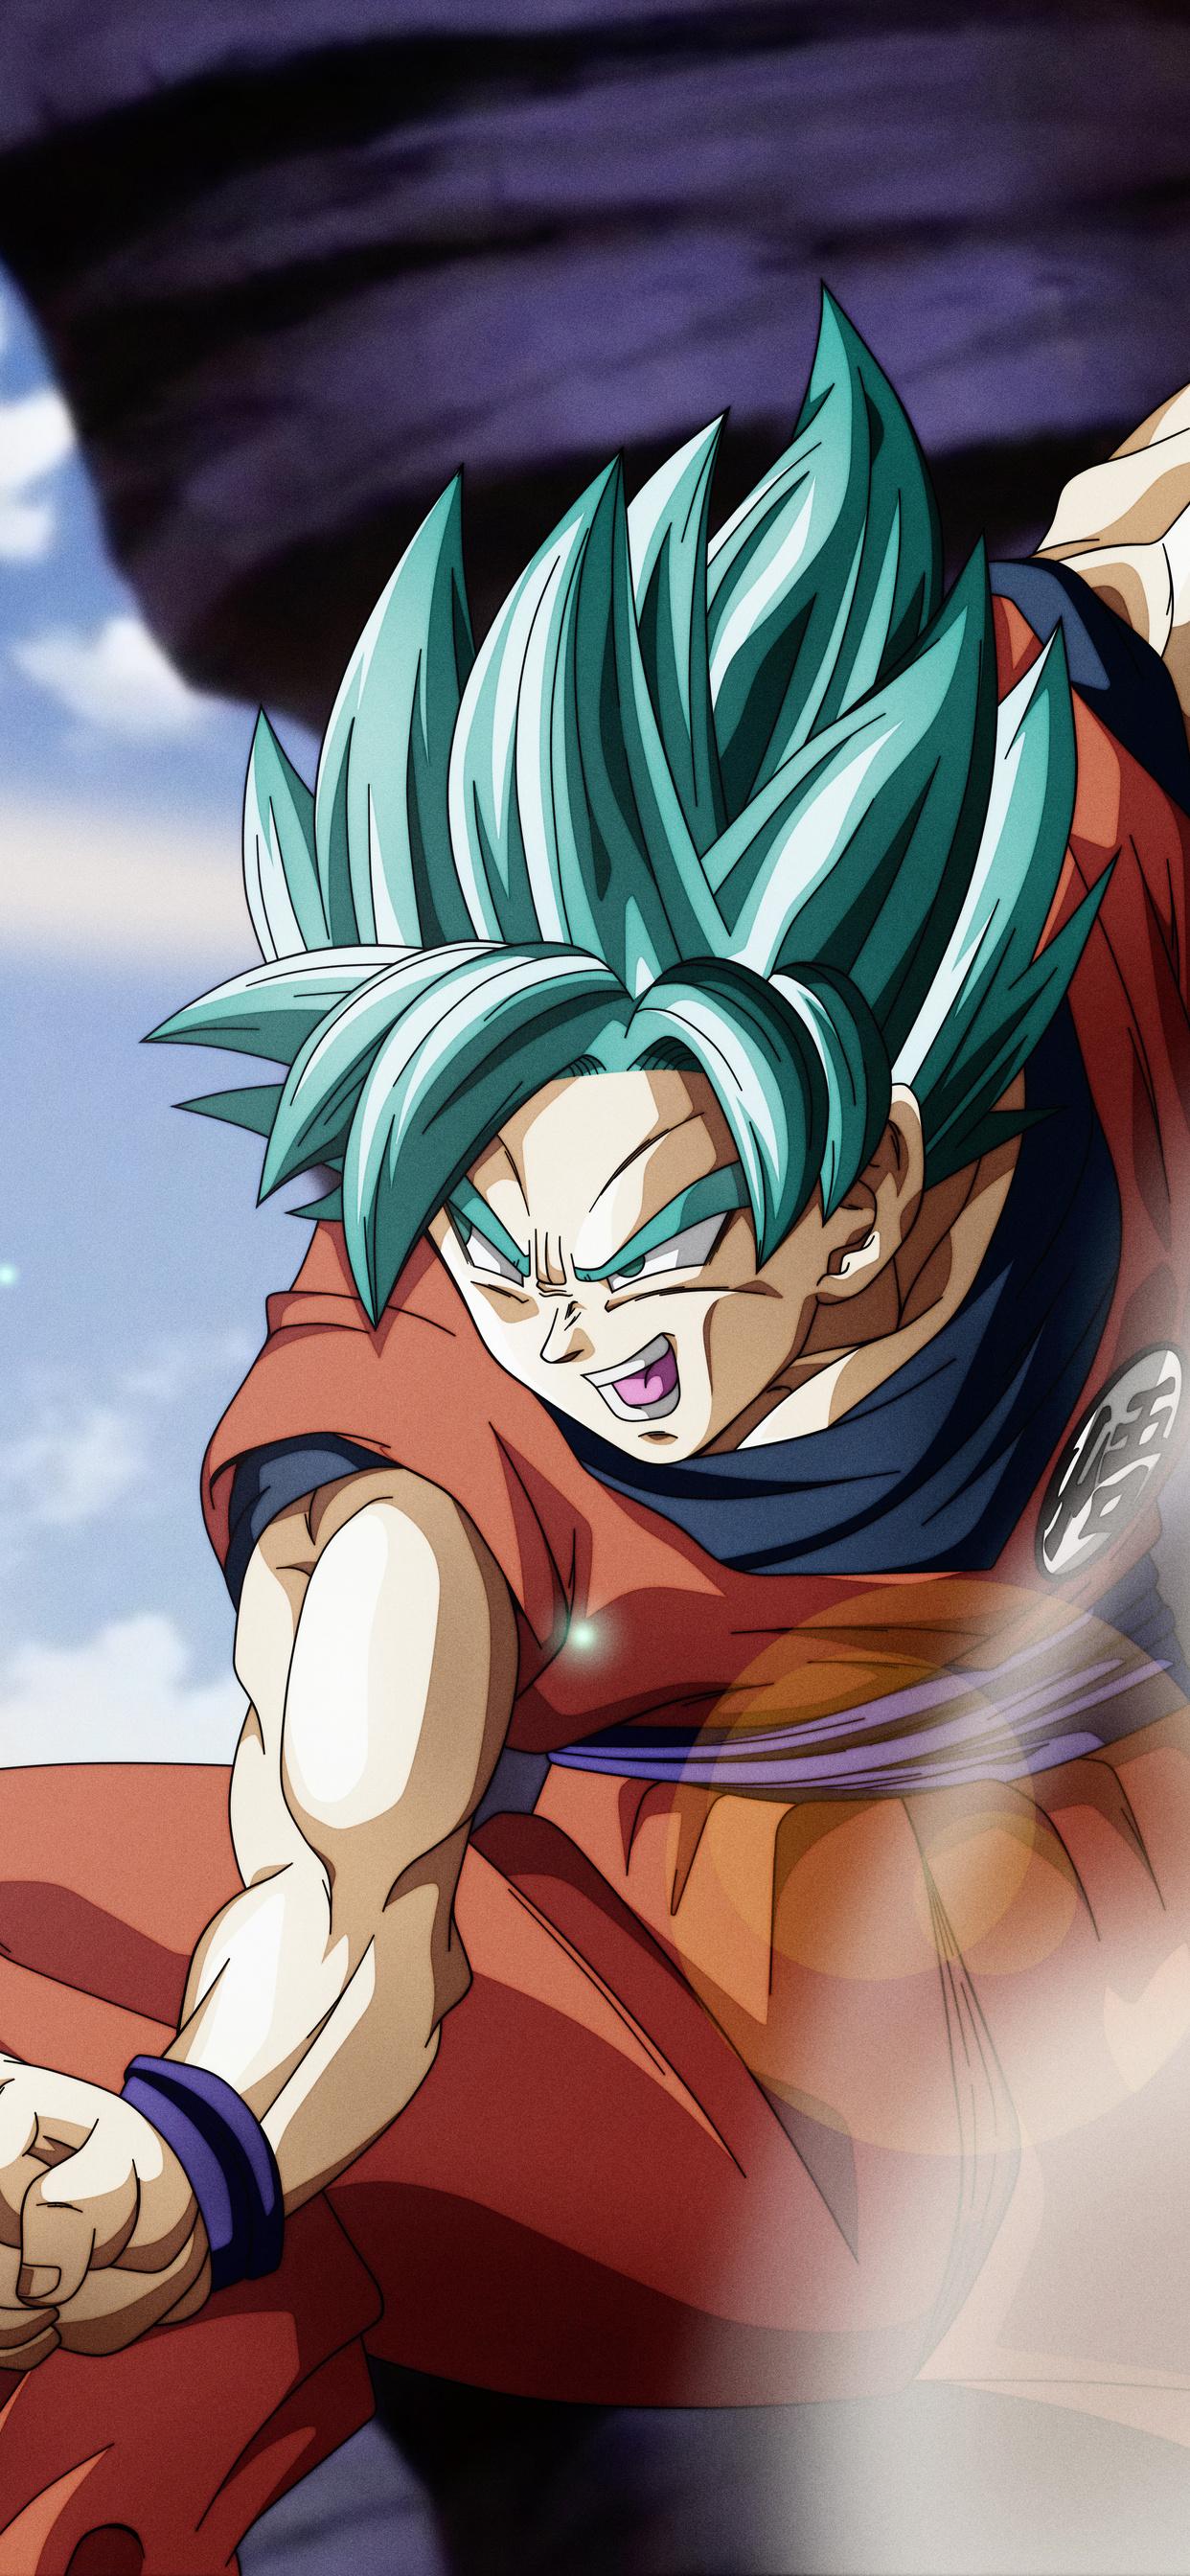 1242x2688 Goku Super Saiyan Blue Iphone Xs Max Hd 4k Wallpapers